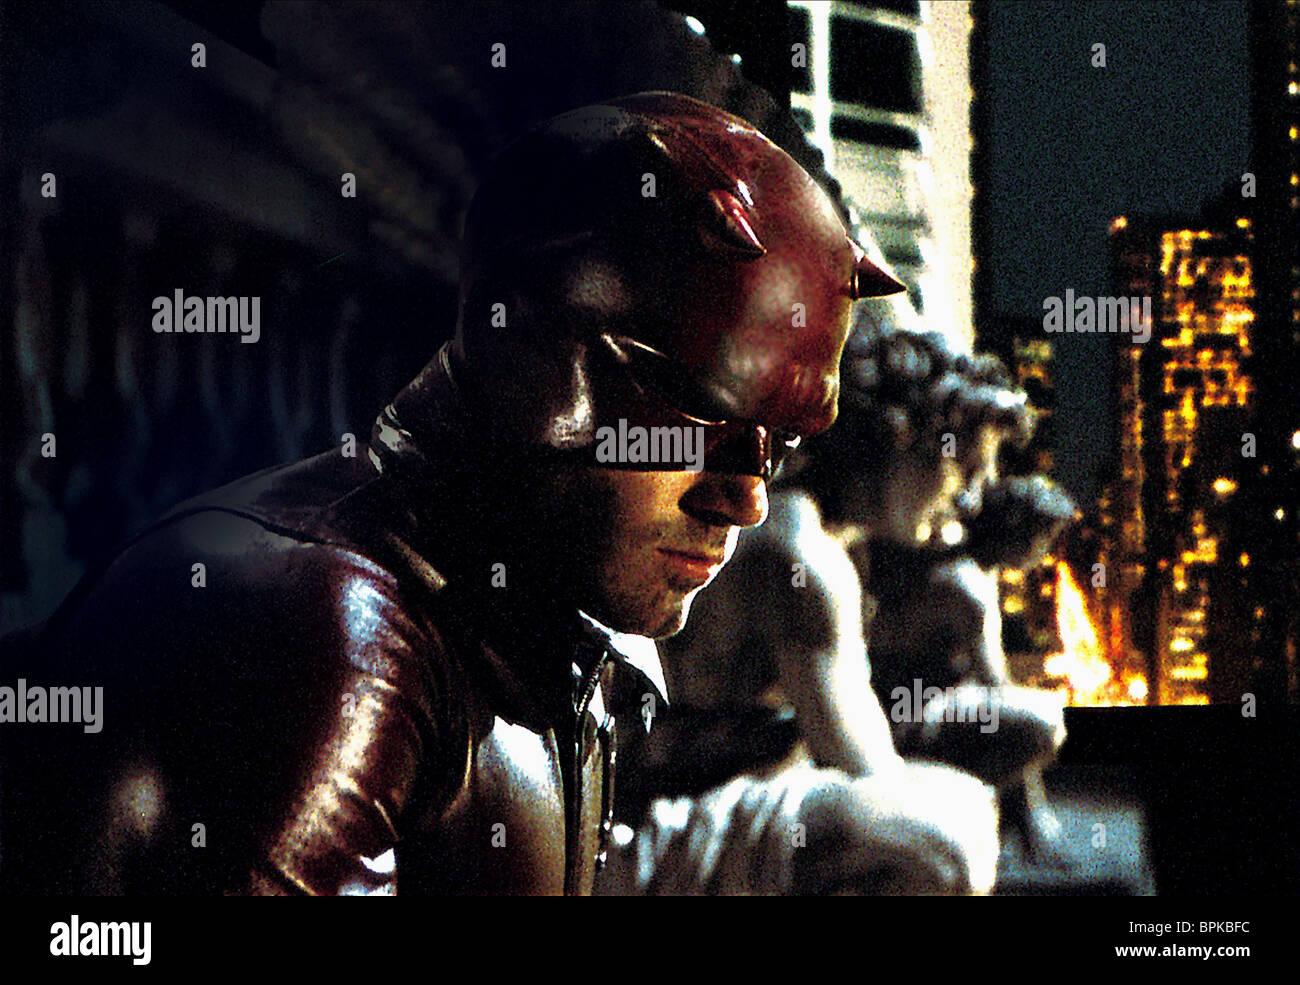 Ben Affleck Daredevil 2003 Stock Photo Alamy